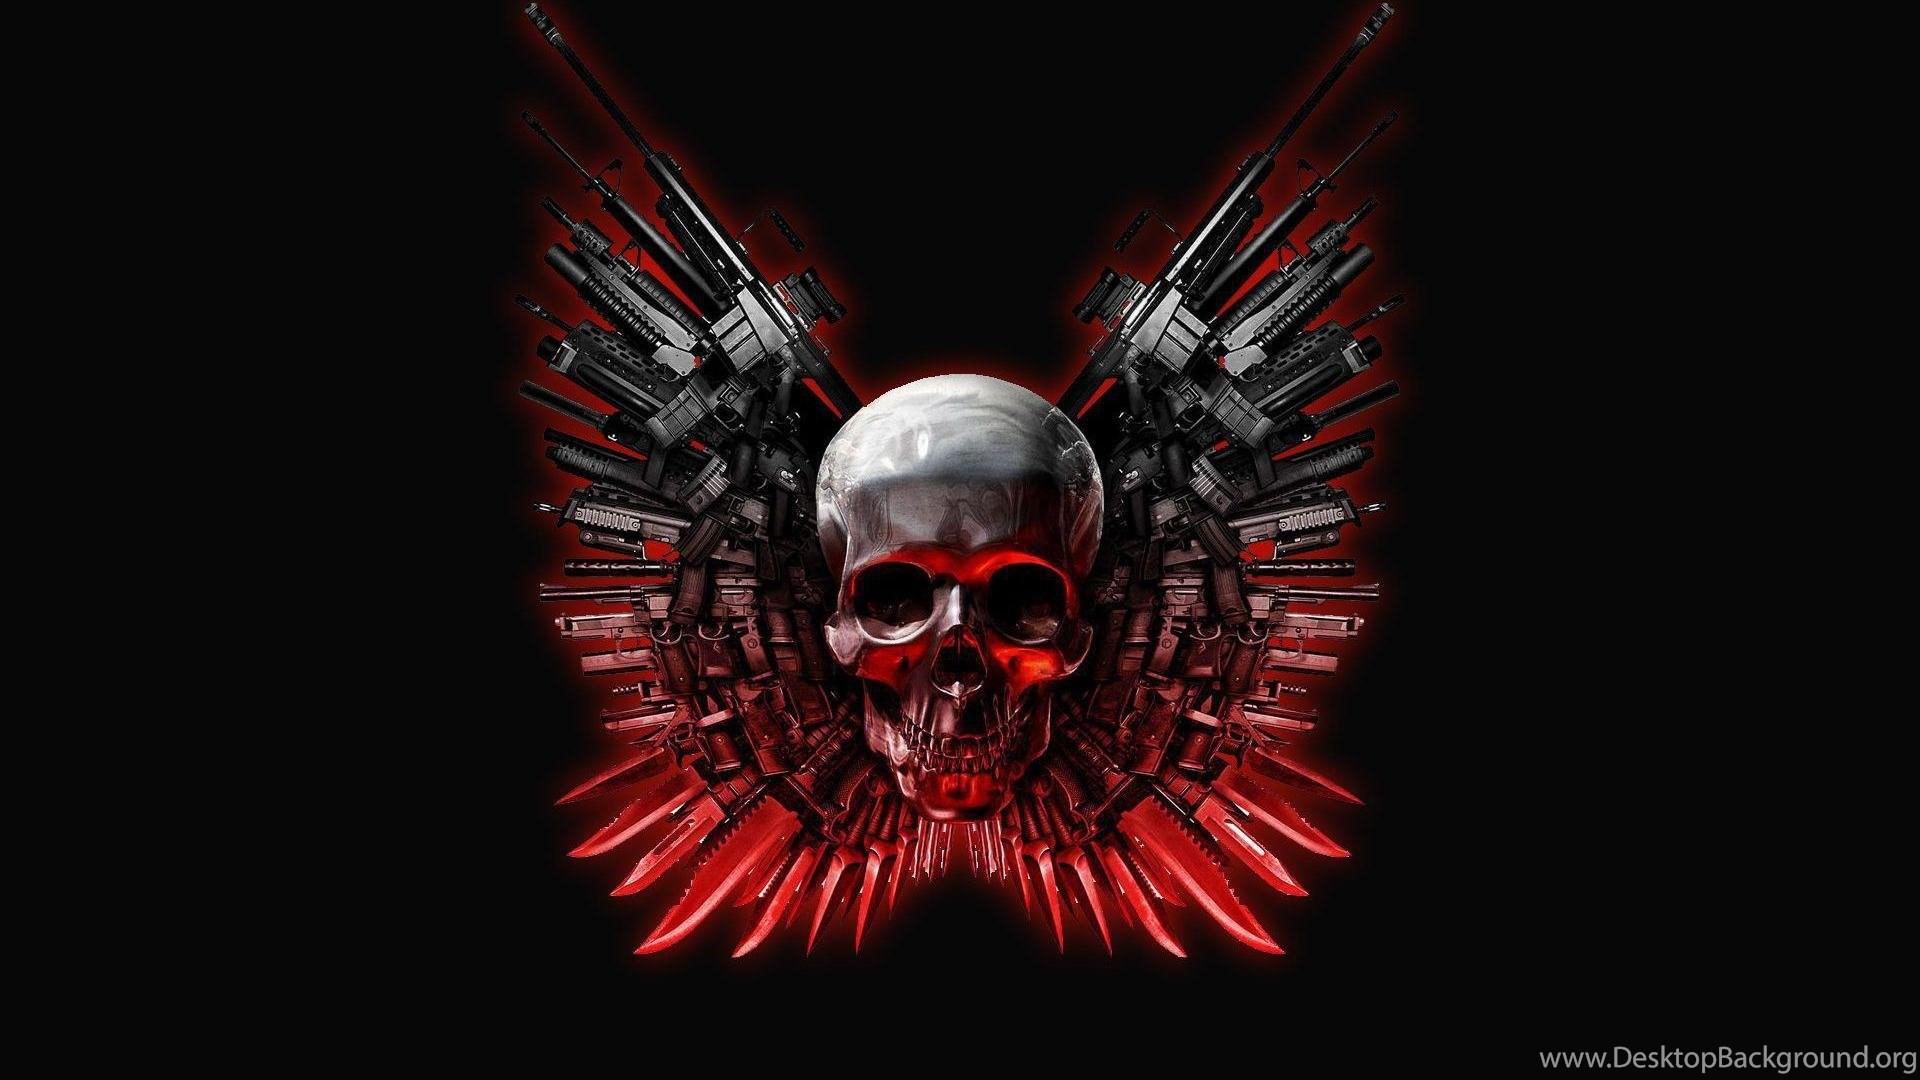 Incredible Neon Skull Wallpaper: RED SKULL WALLPAPER ( Desktop Background